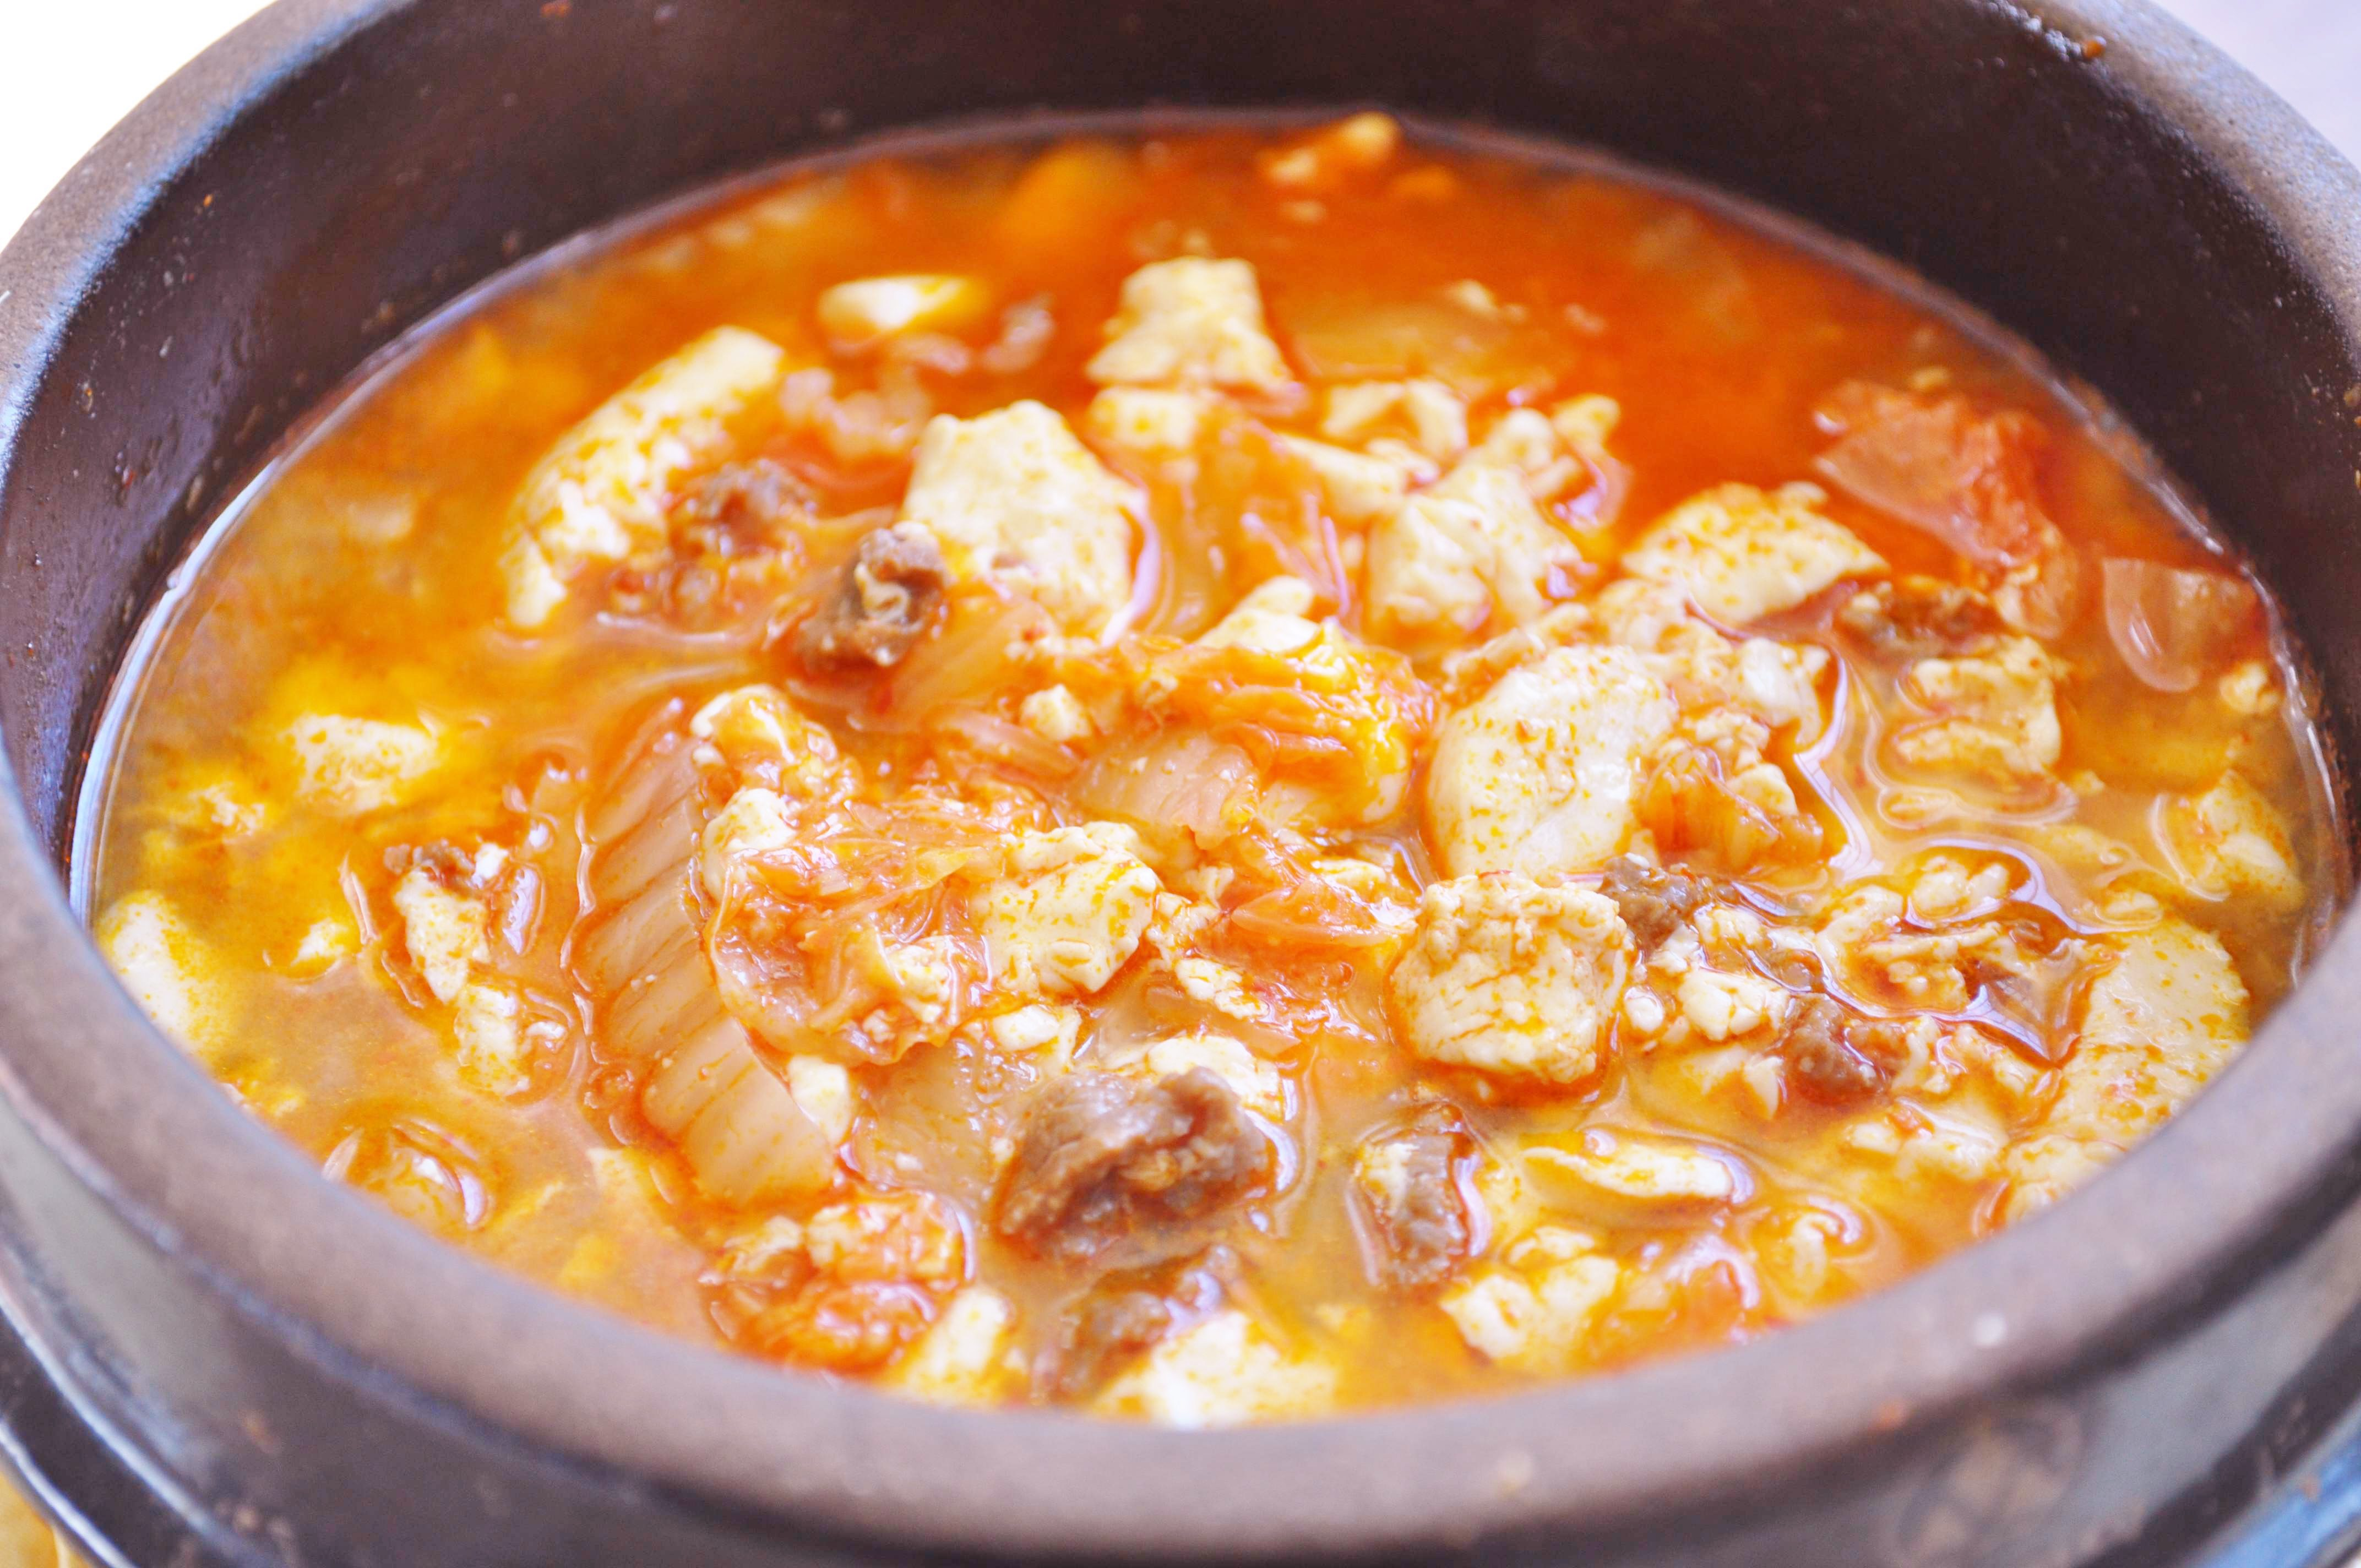 Kimchi Soondubu Jjigae (Spicy Soft Tofu Stew with Kimchi)